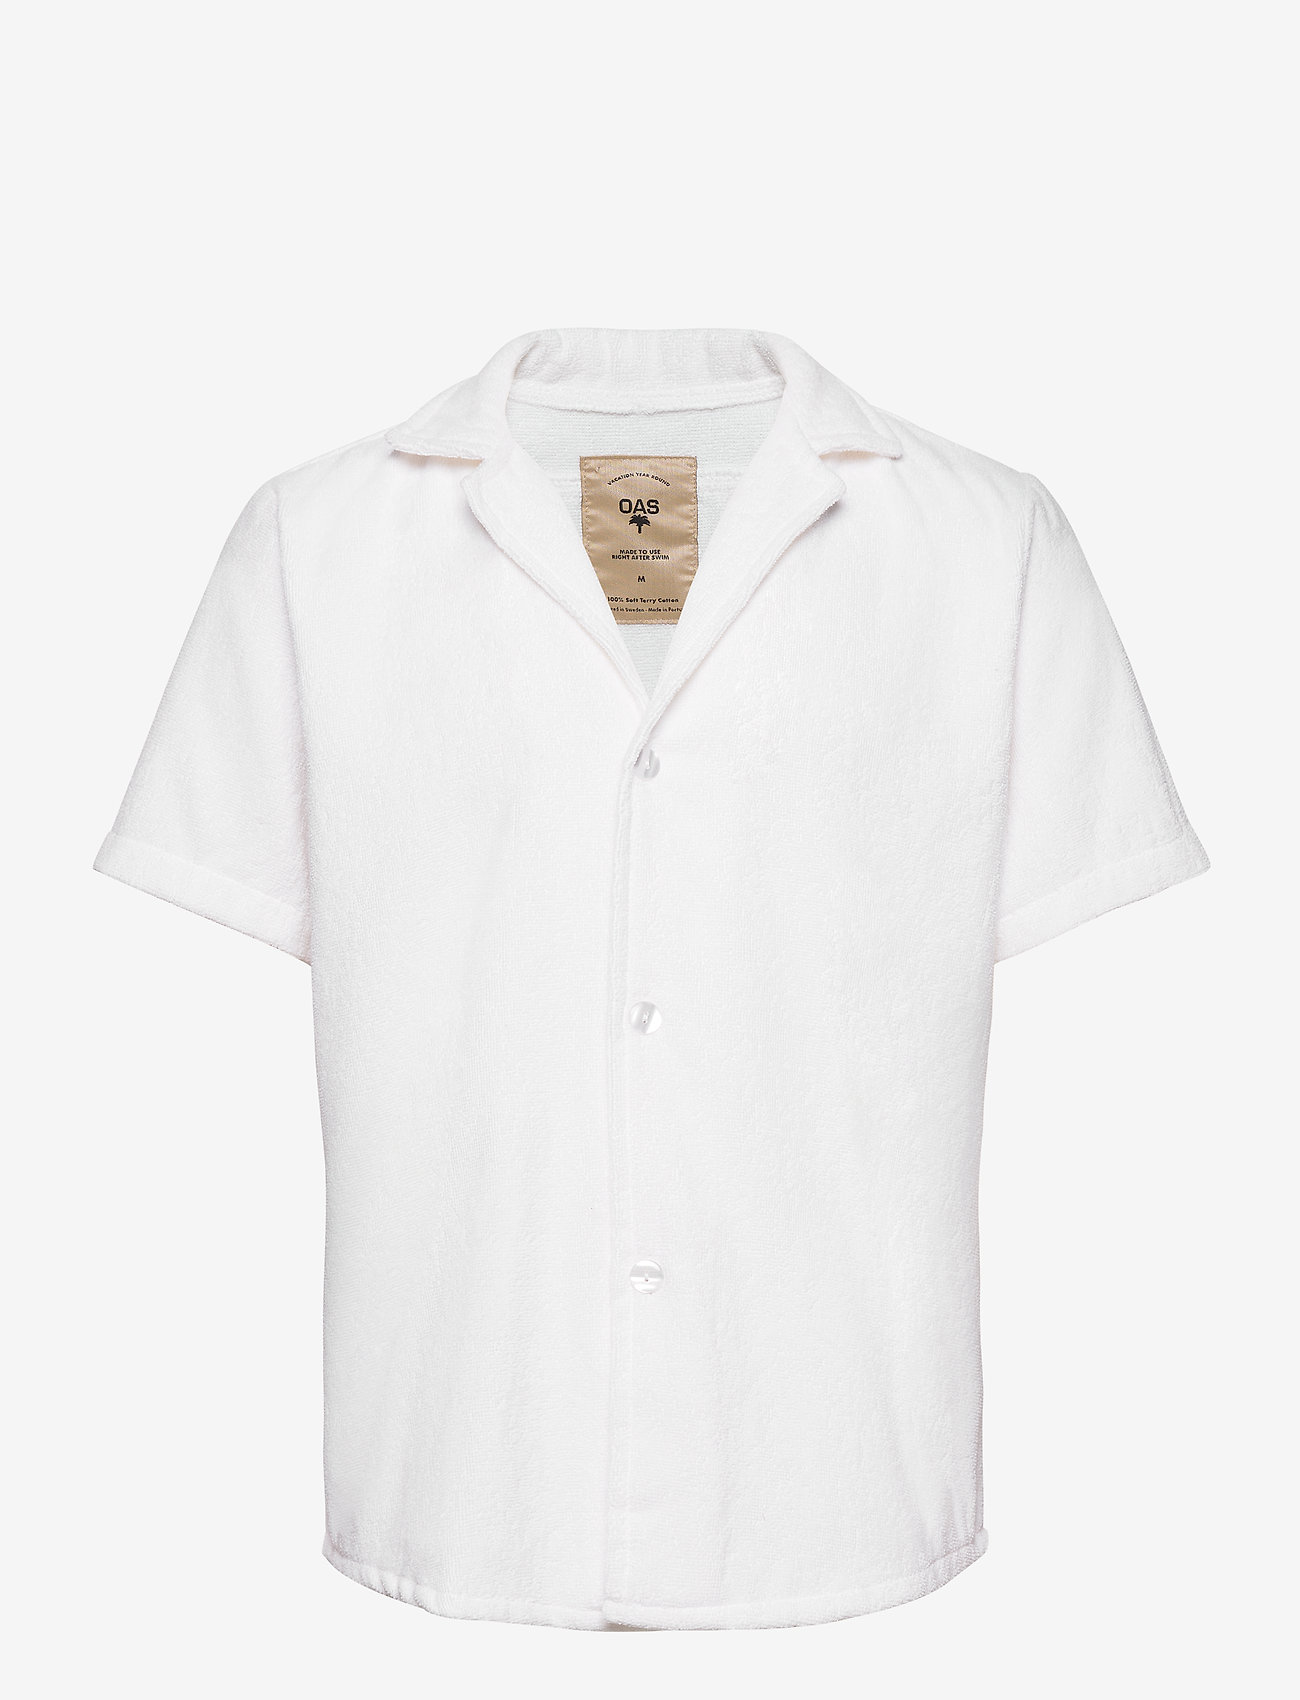 OAS - White Cuba Terry Shirt - overhemden korte mouwen - white - 0